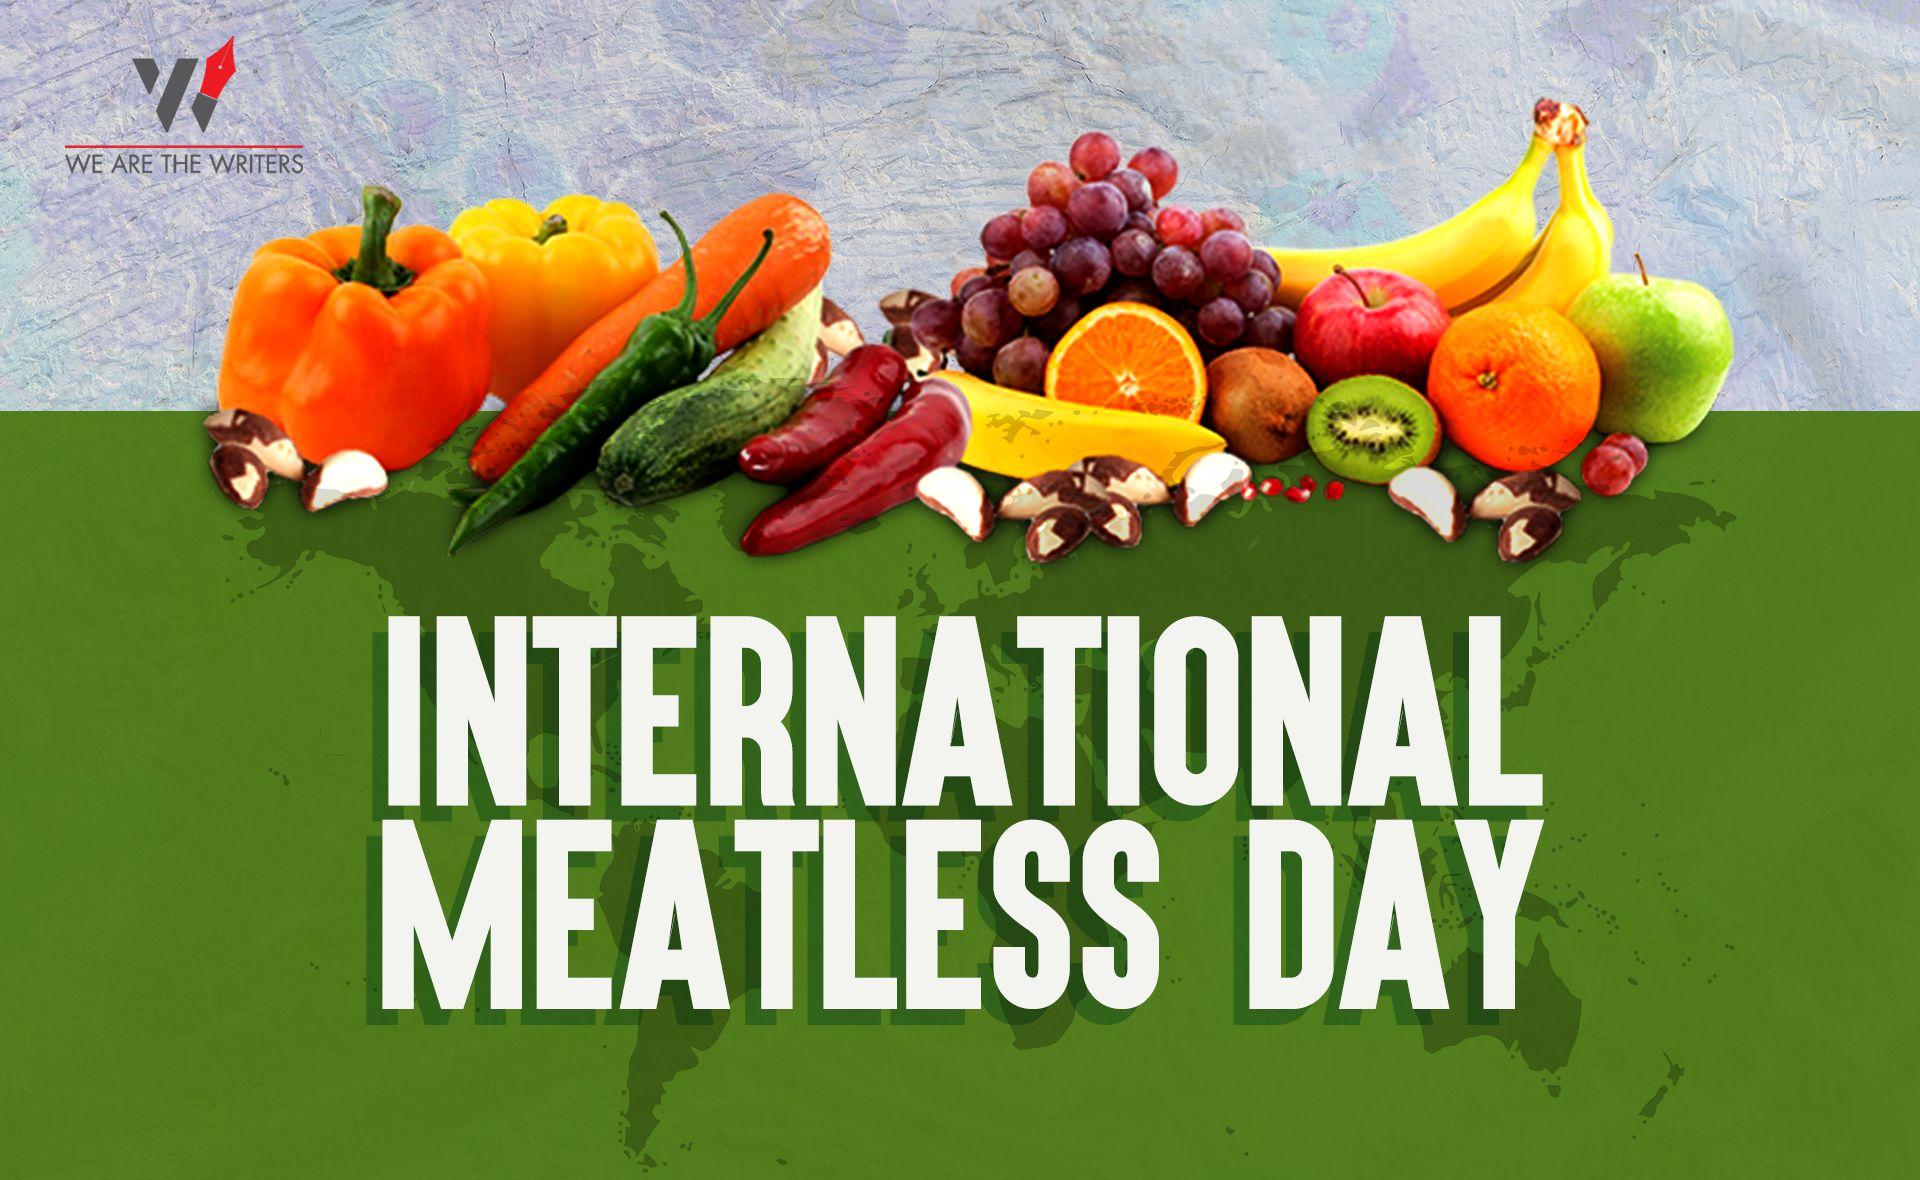 International Vegetarian Day